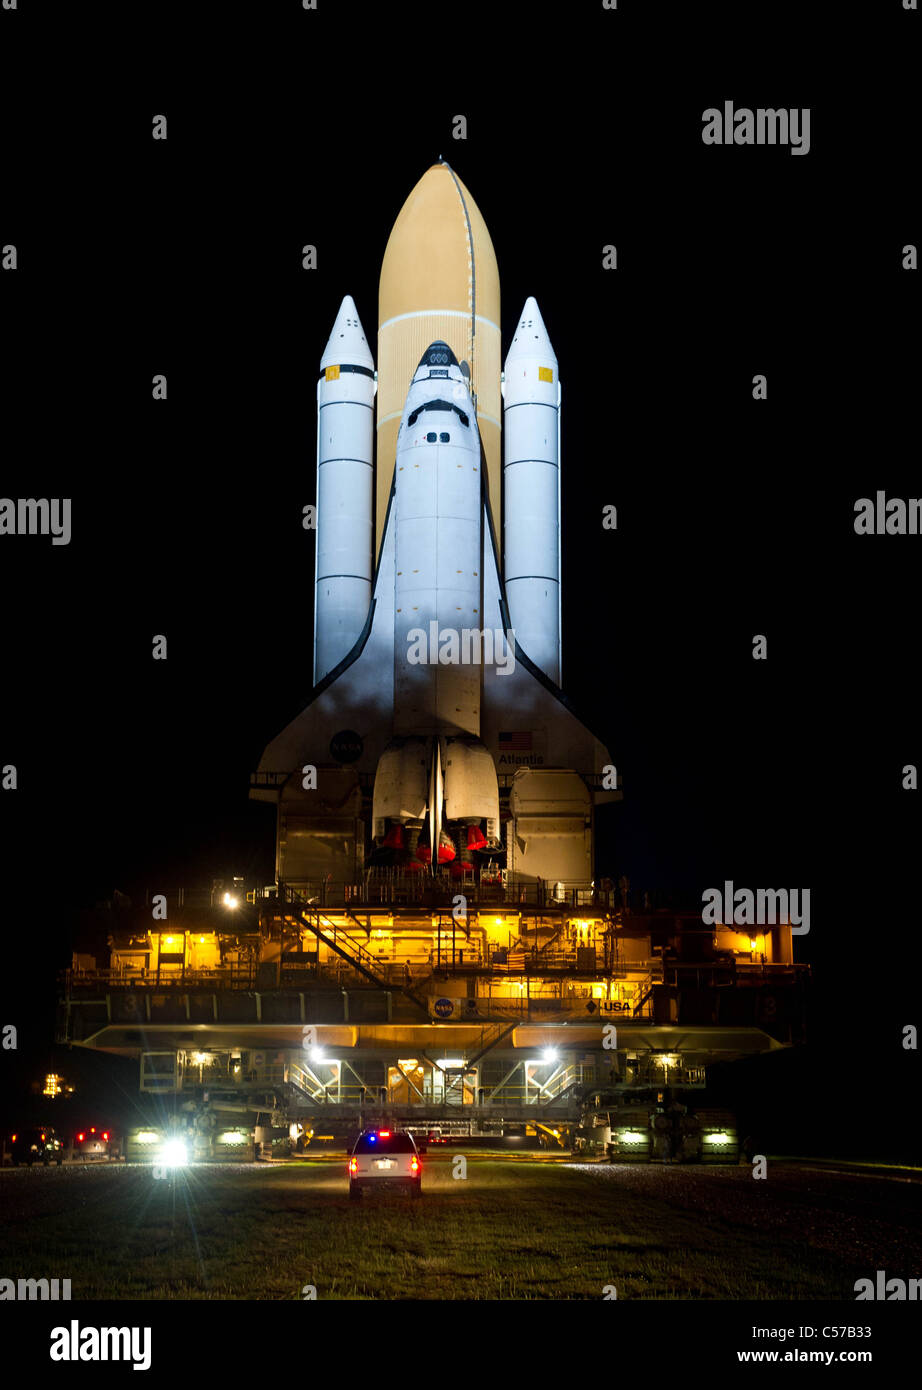 nasa last space shuttle mission - photo #22